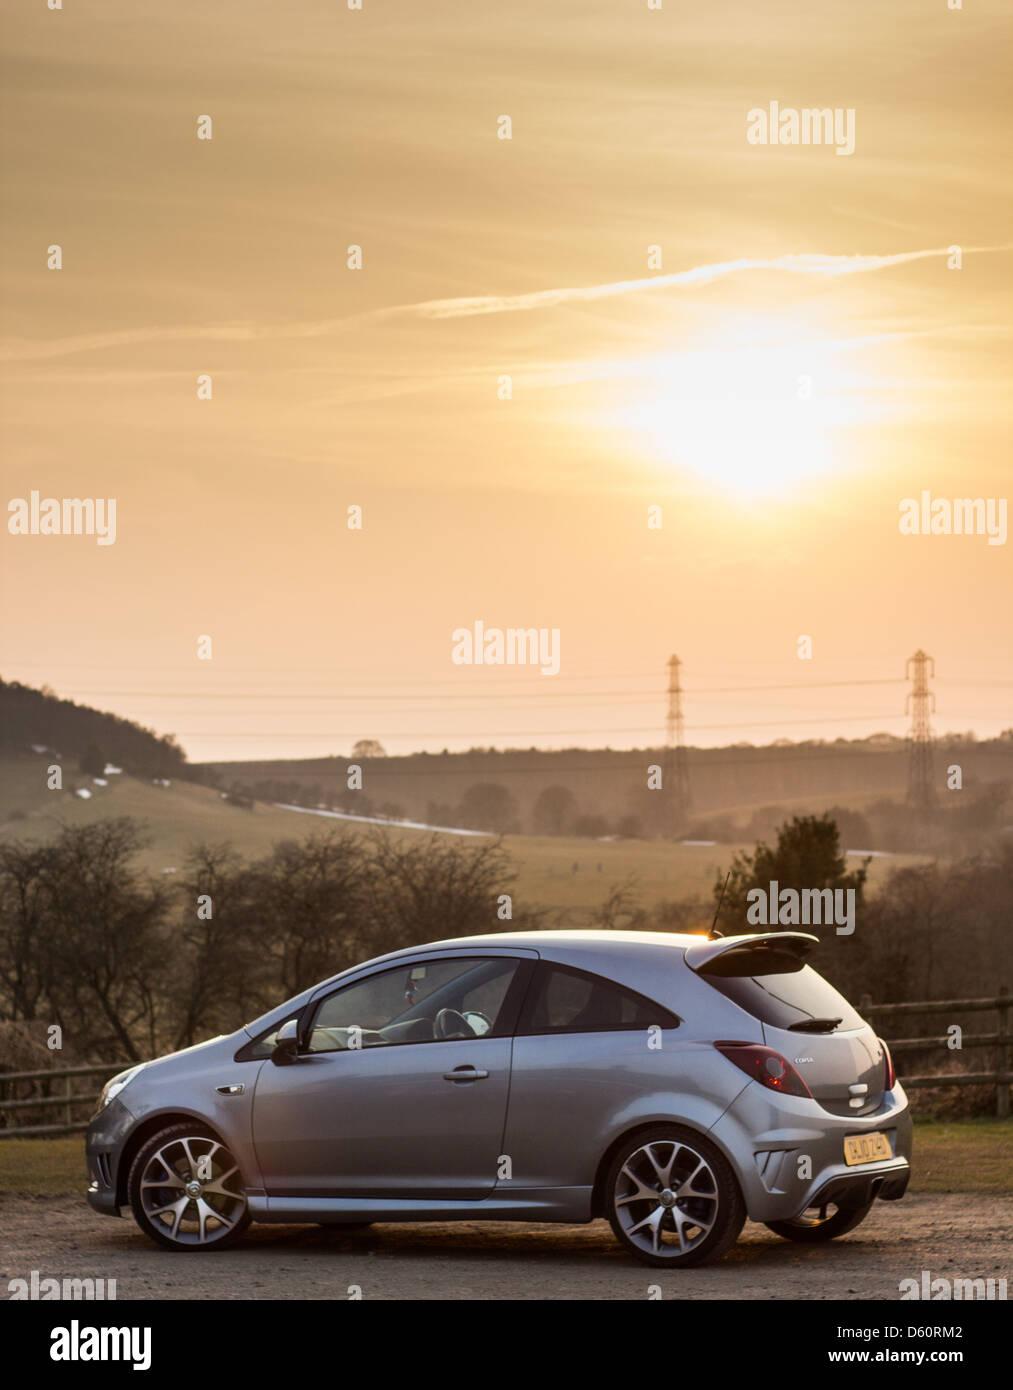 Vauxhaul corsa Vxr al atardecer Imagen De Stock